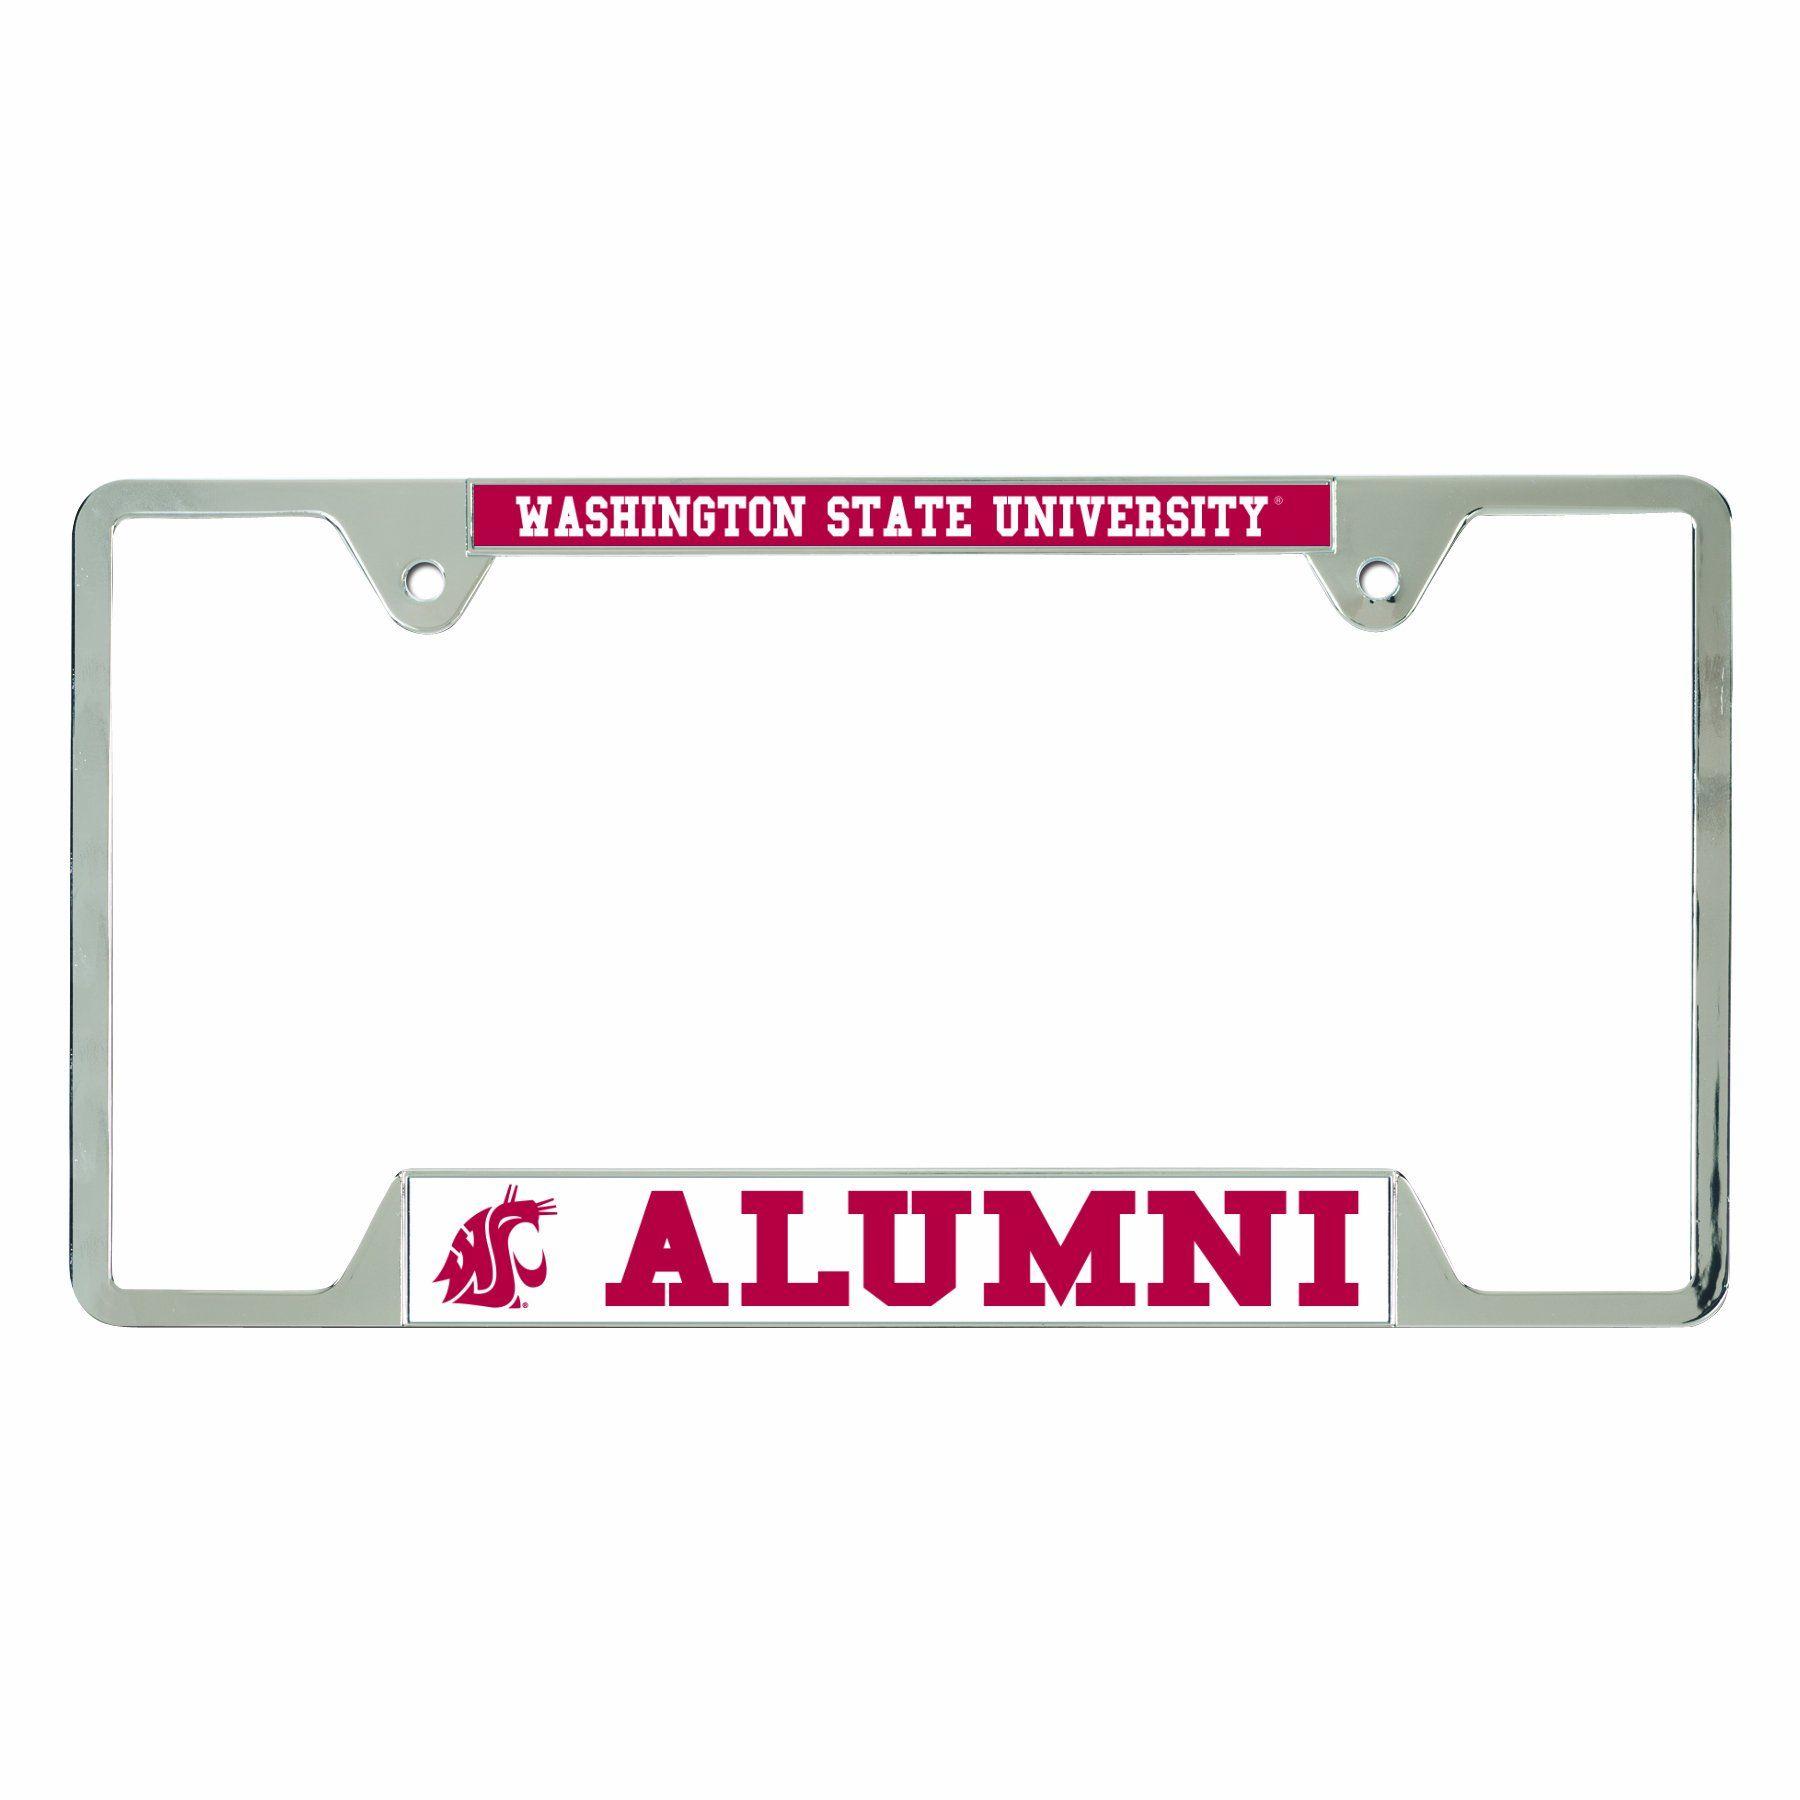 WSU Alumni License Plate Frame | Wish List | Pinterest | Plates and ...